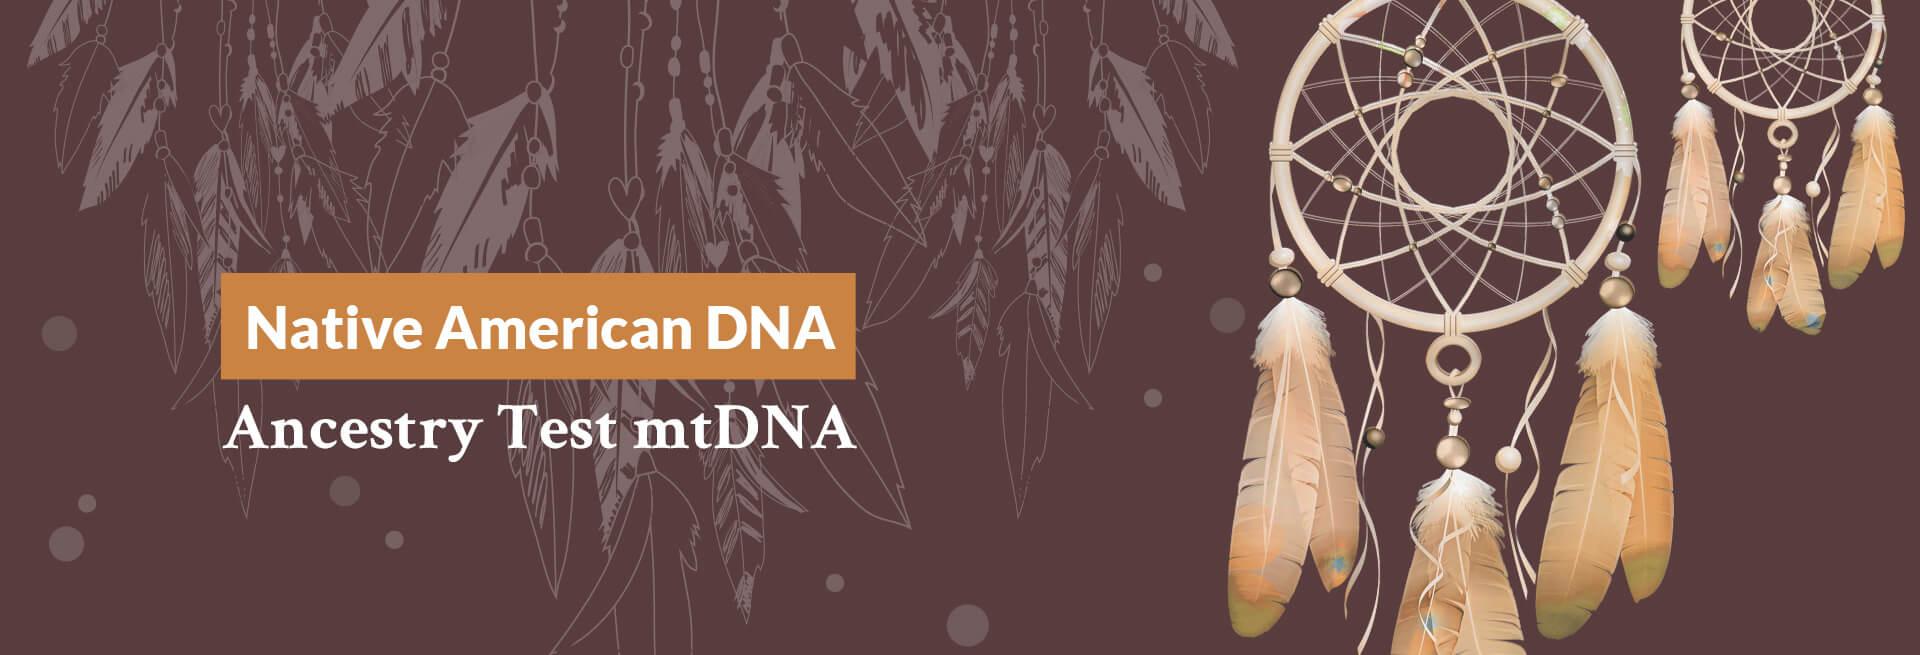 native-american-ancestry-test-mtDNA